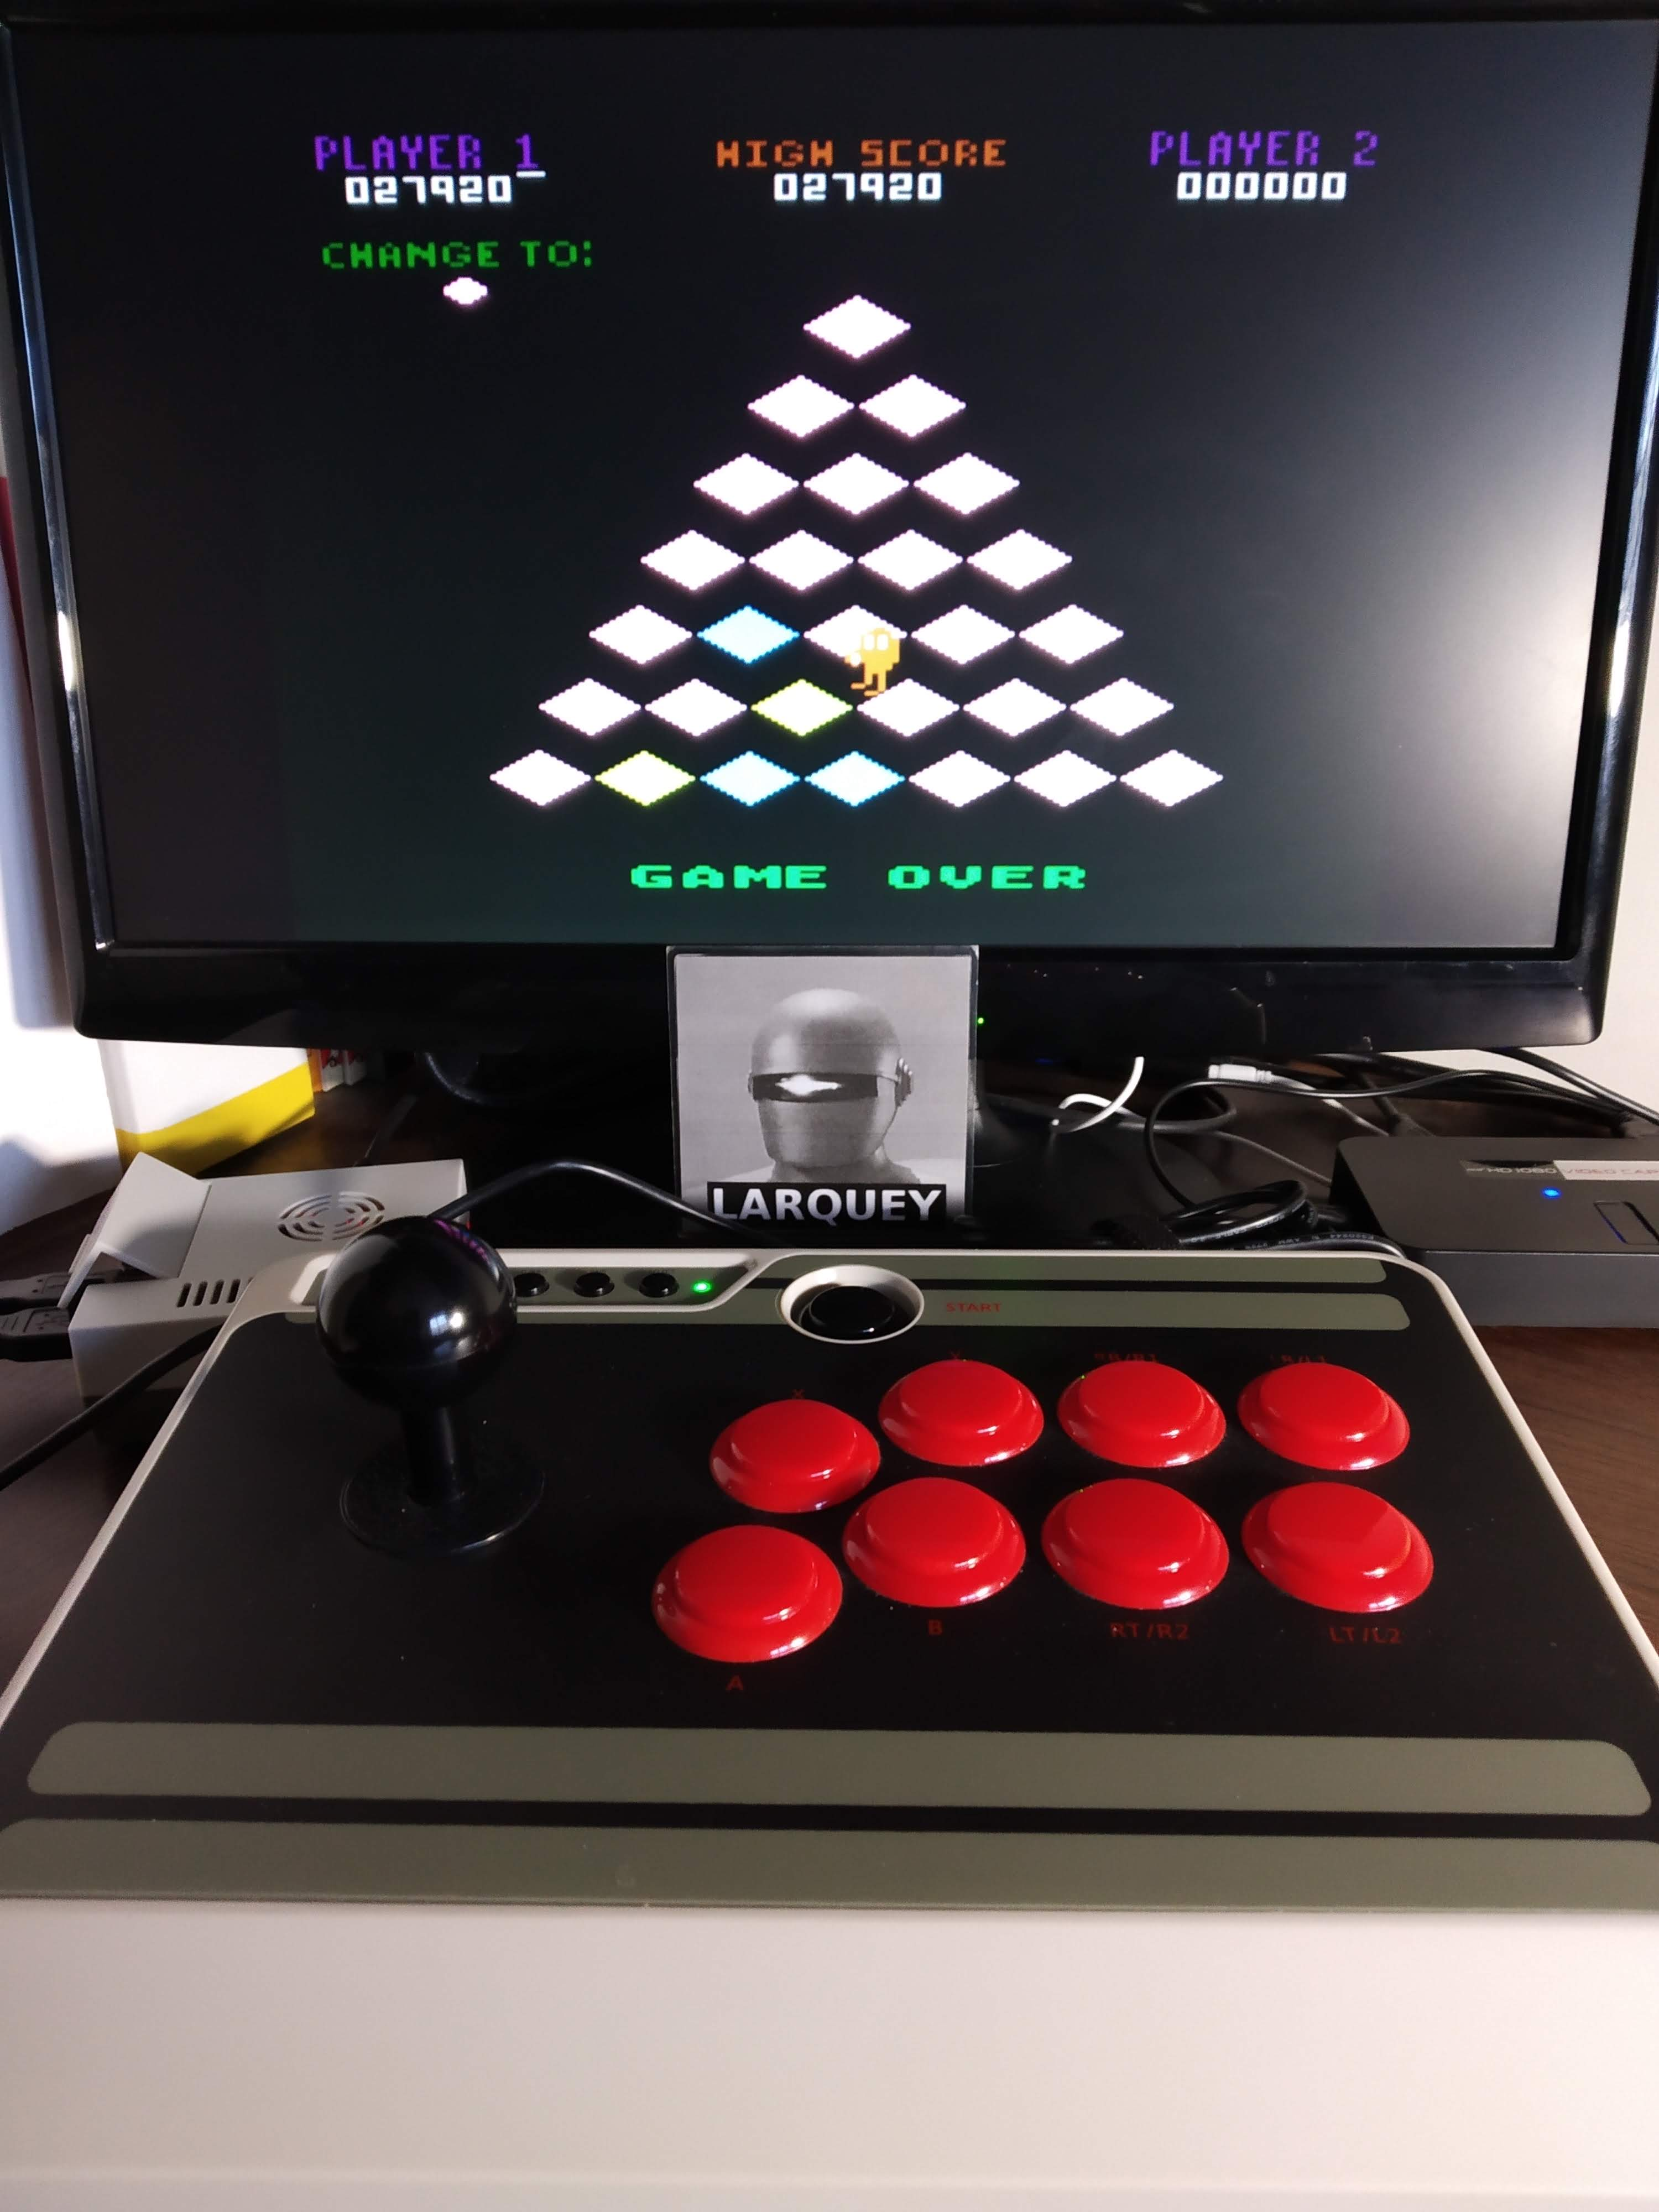 Larquey: Q*Bert: Game 1 (Atari 5200 Emulated) 27,920 points on 2019-11-16 07:04:36